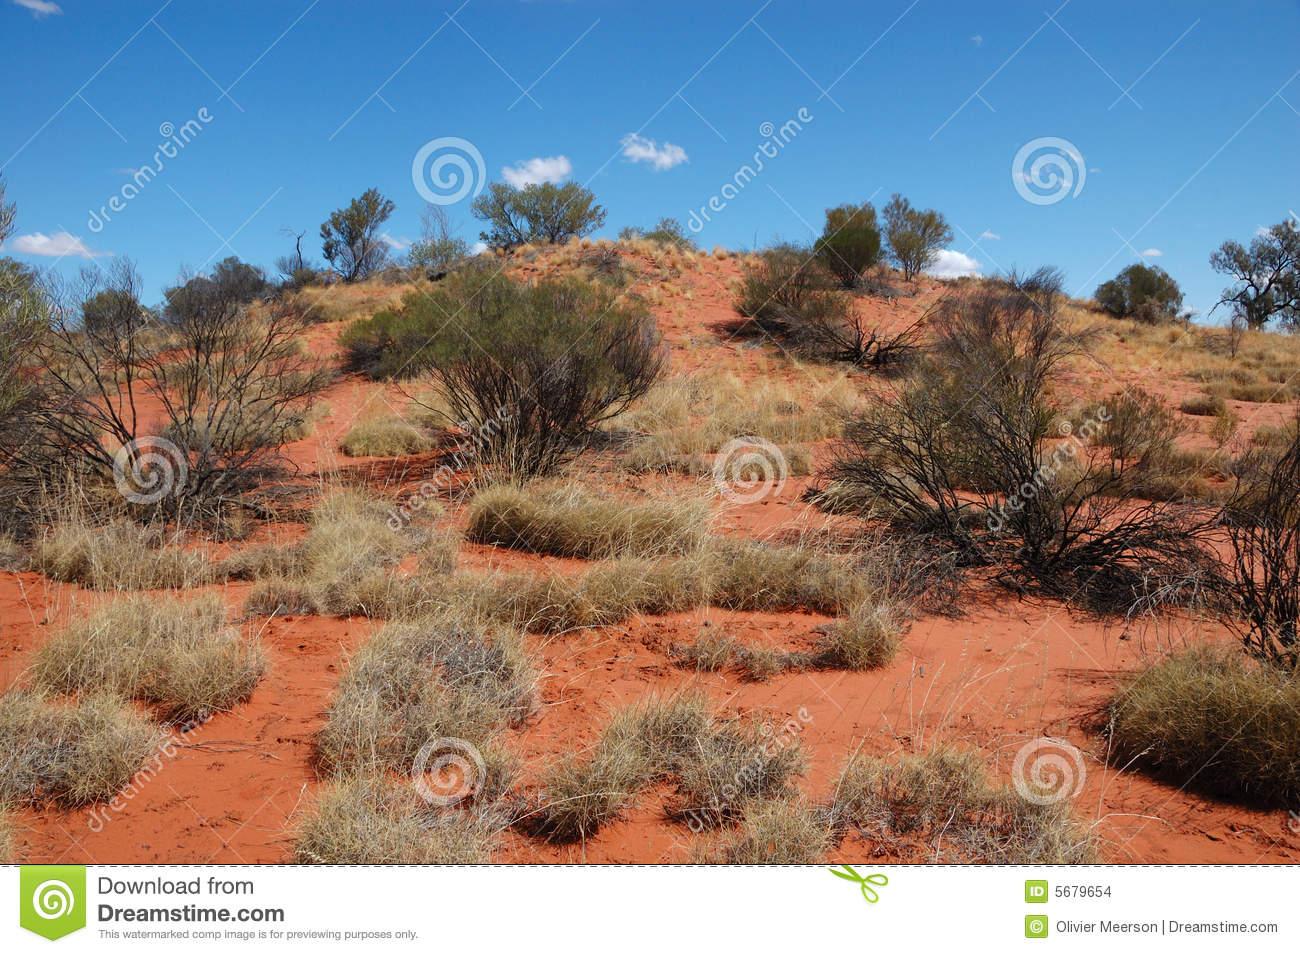 Simpson Desert clipart #13, Download drawings